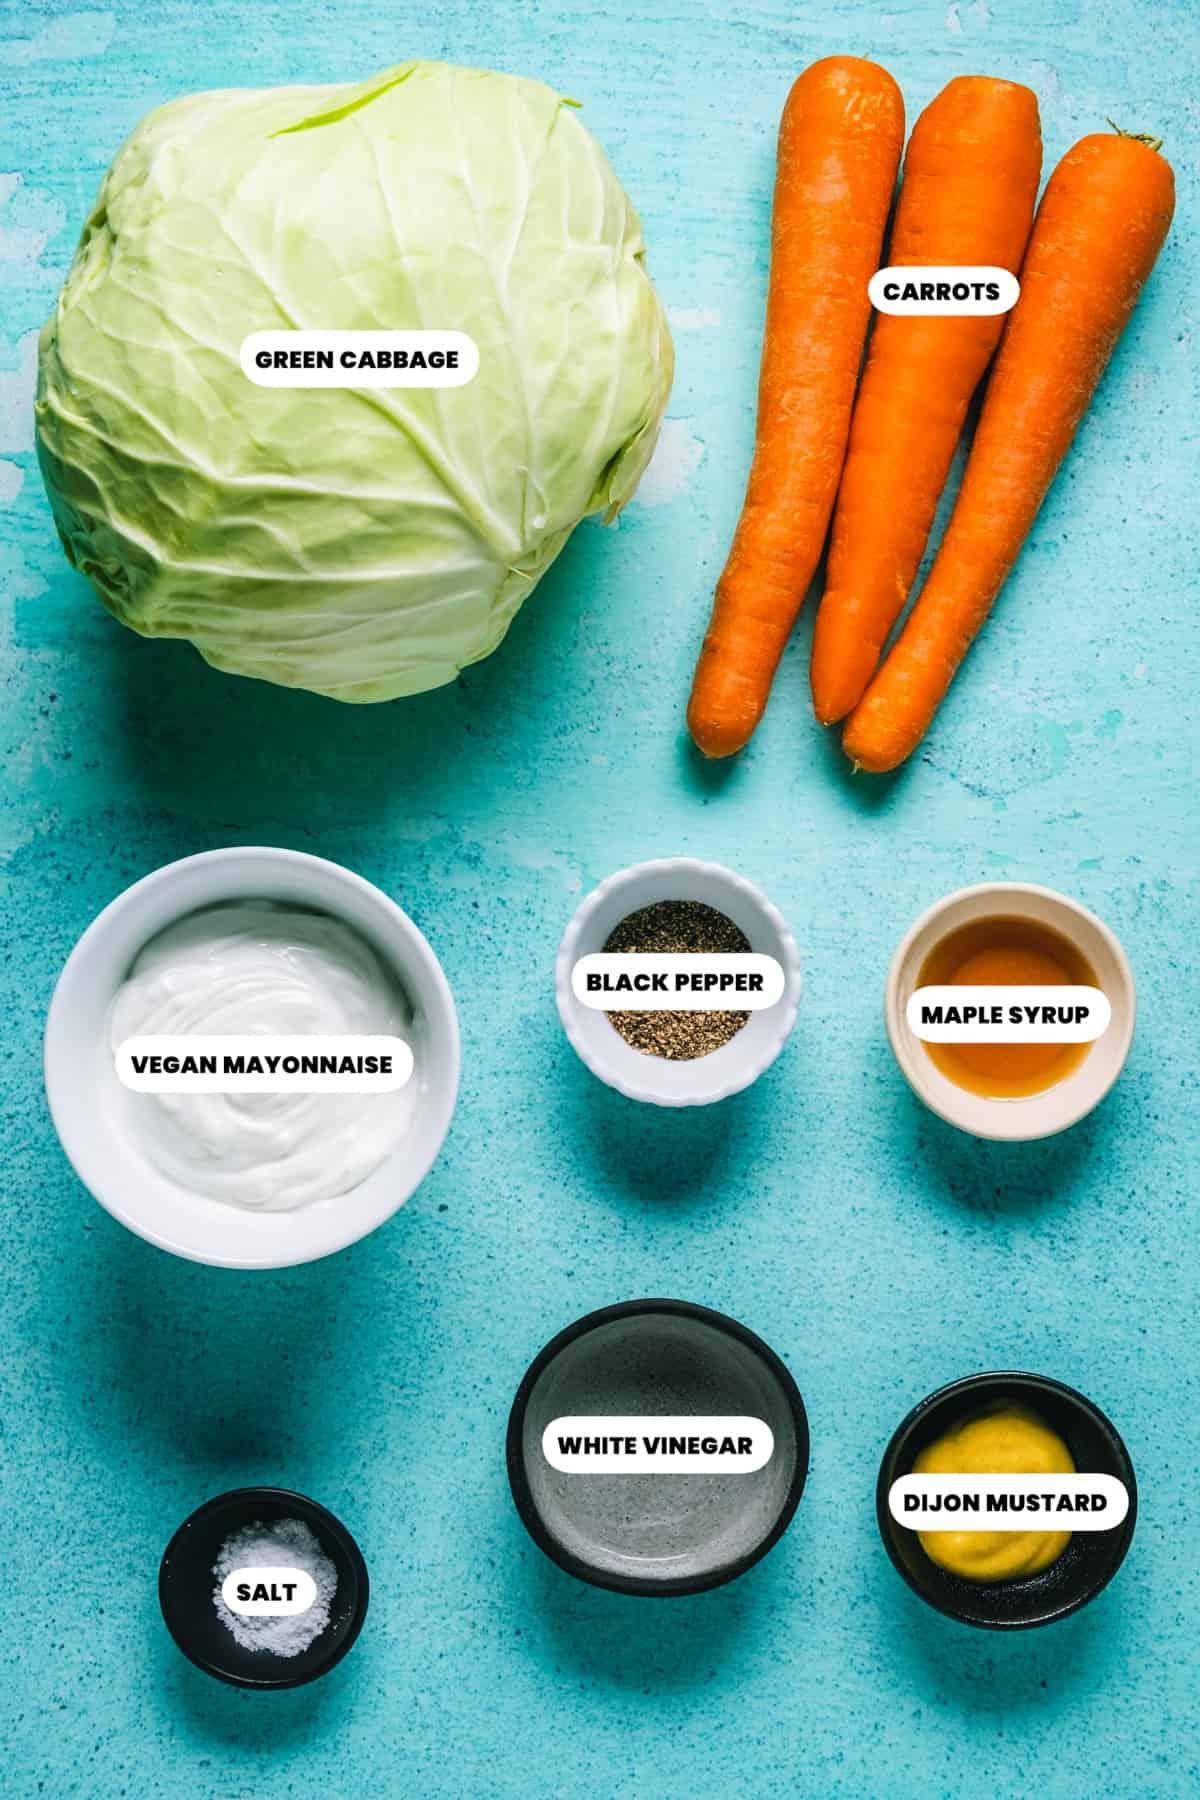 Photo of the ingredients needed to make vegan coleslaw.